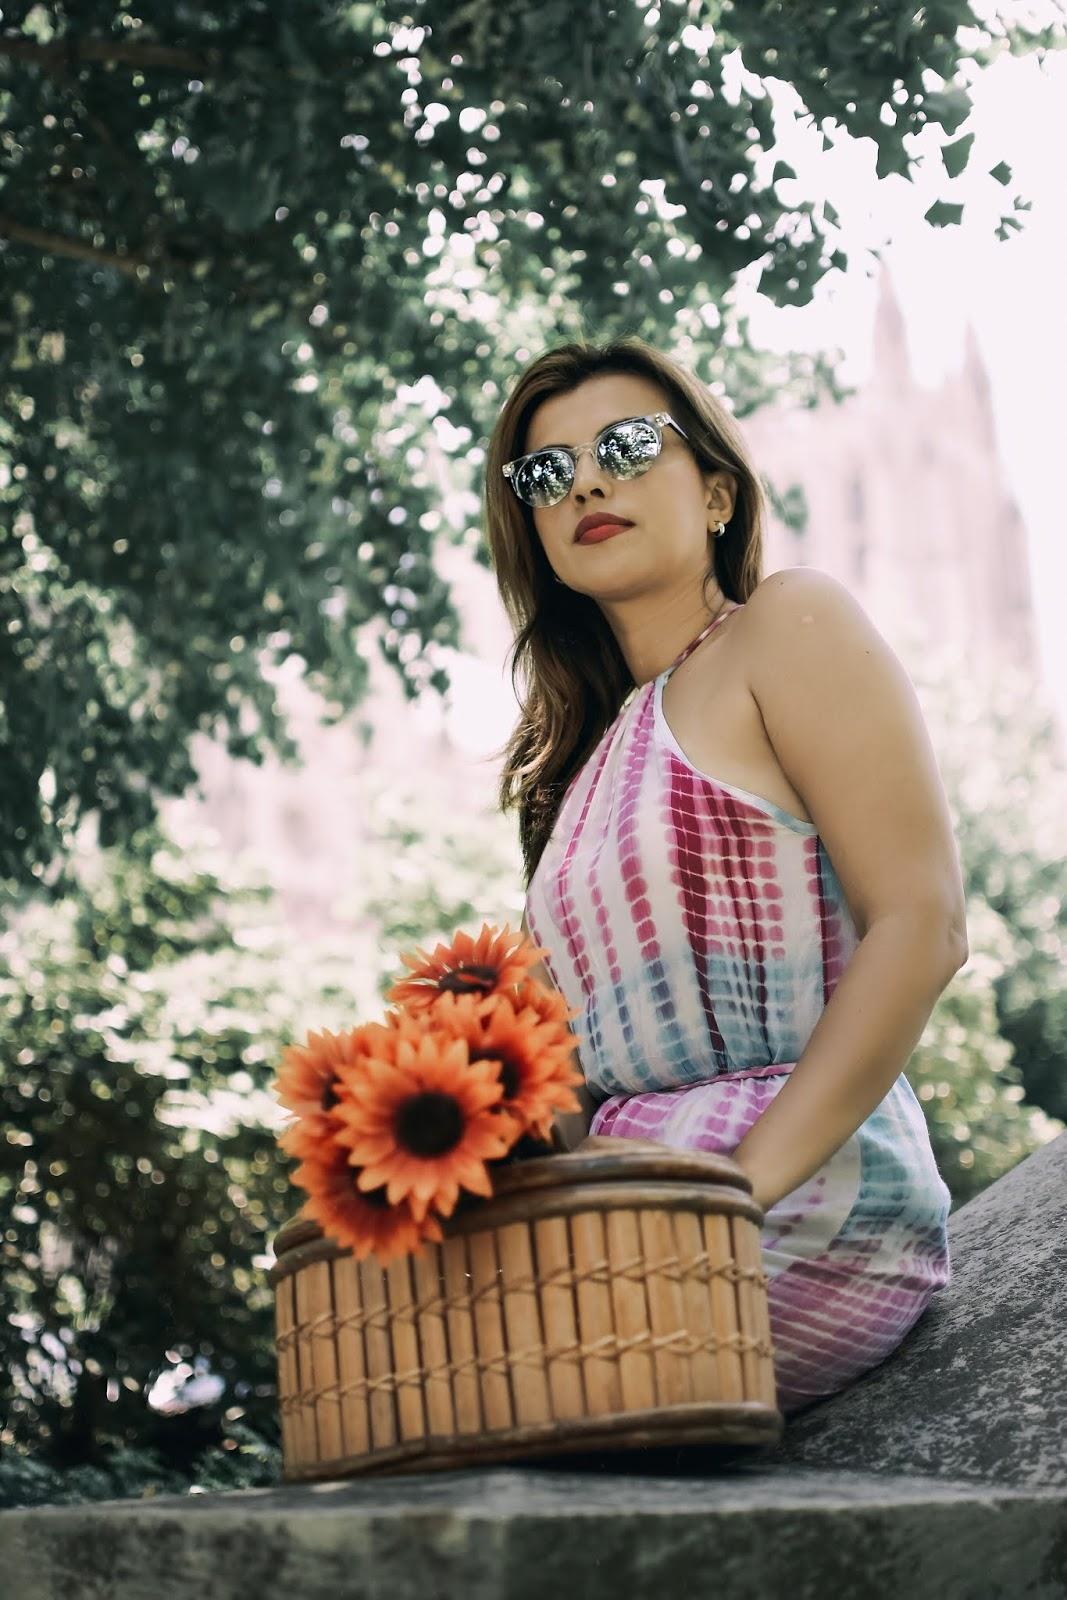 The Perfect Sunglasses - Banana Republic-MariEstilo-look of the day-fashionblogger-its banana-fashionista-streetstyle-verano2018-trendy-moda-DCBlogger